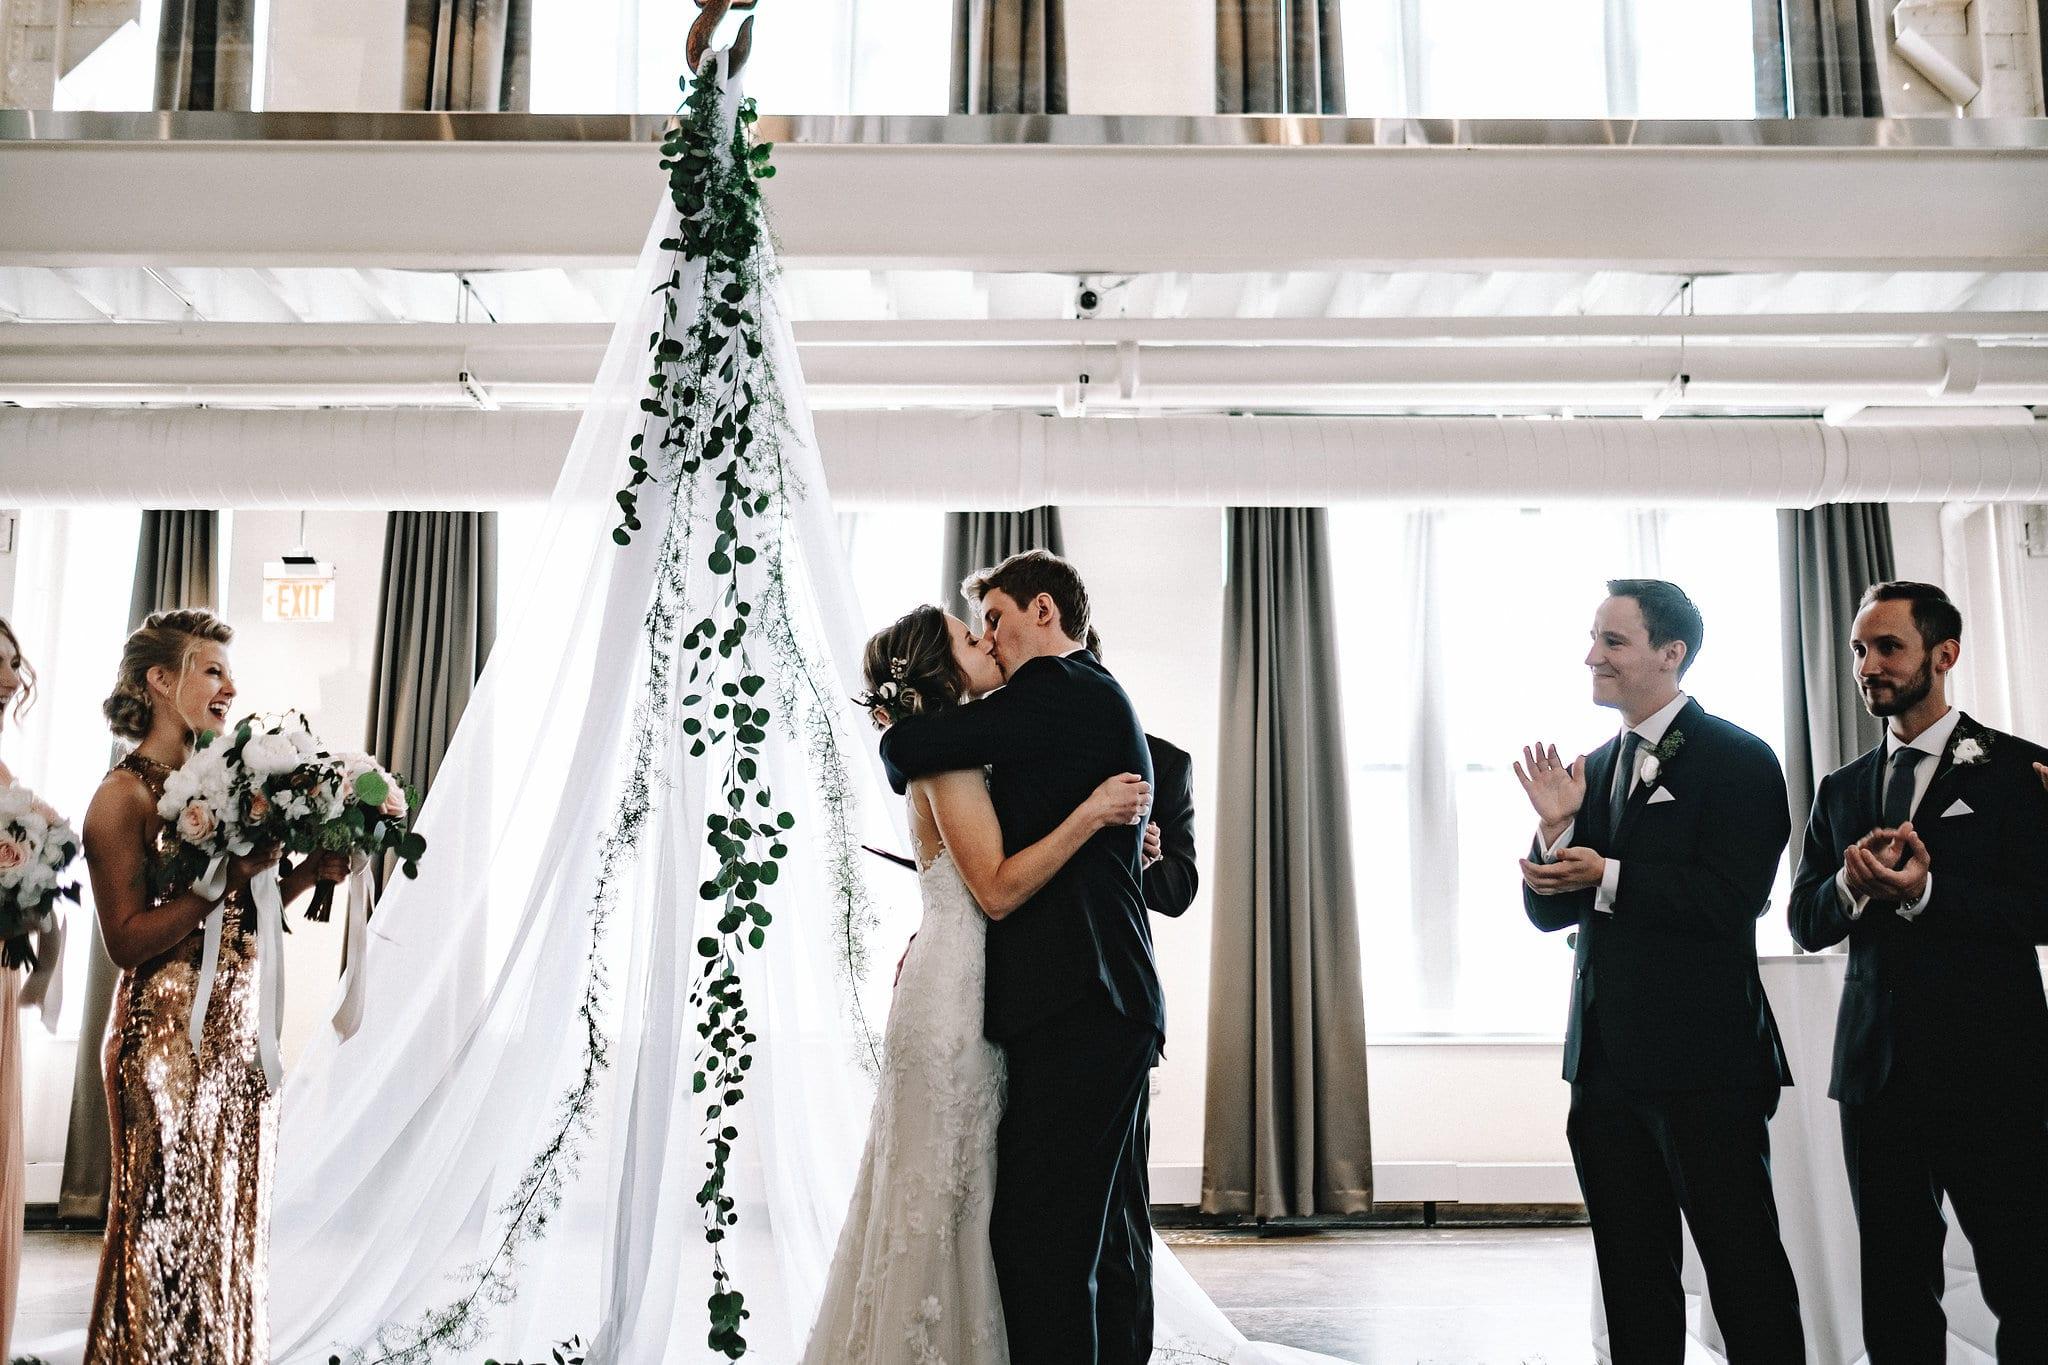 wedding, ceremony backdrops, wedding rentals, Minnesota wedding backdrop, Minnesota wedding rentals, Minneapolis wedding florist